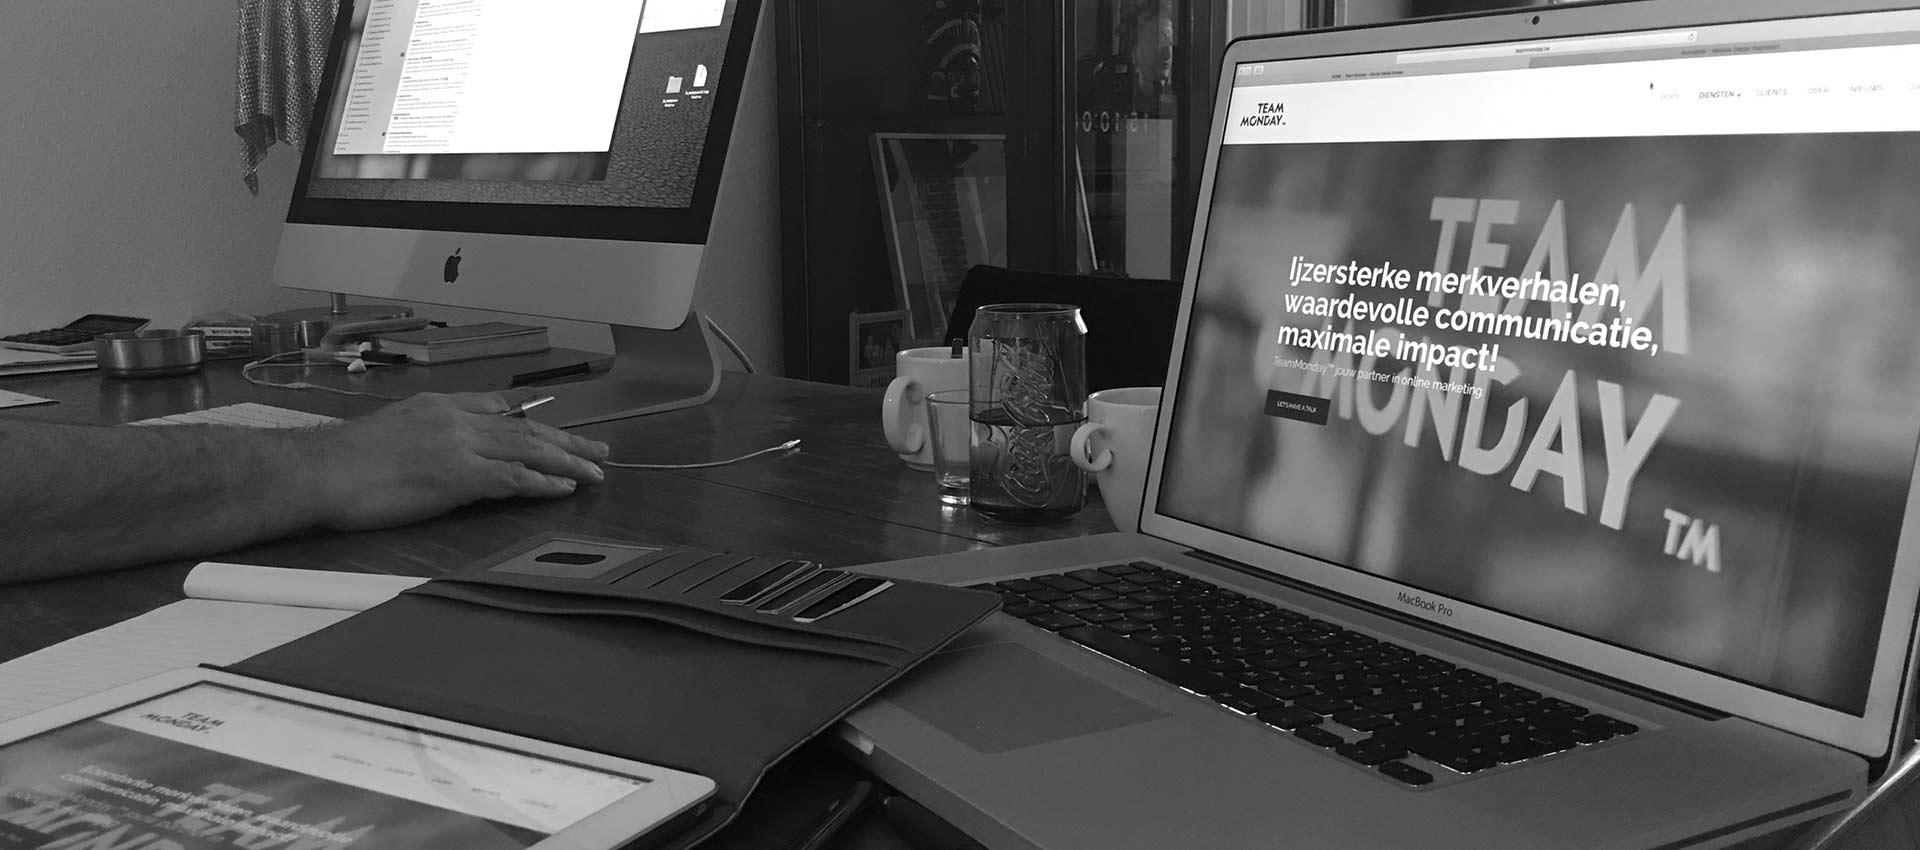 professionele_website_laten_maken